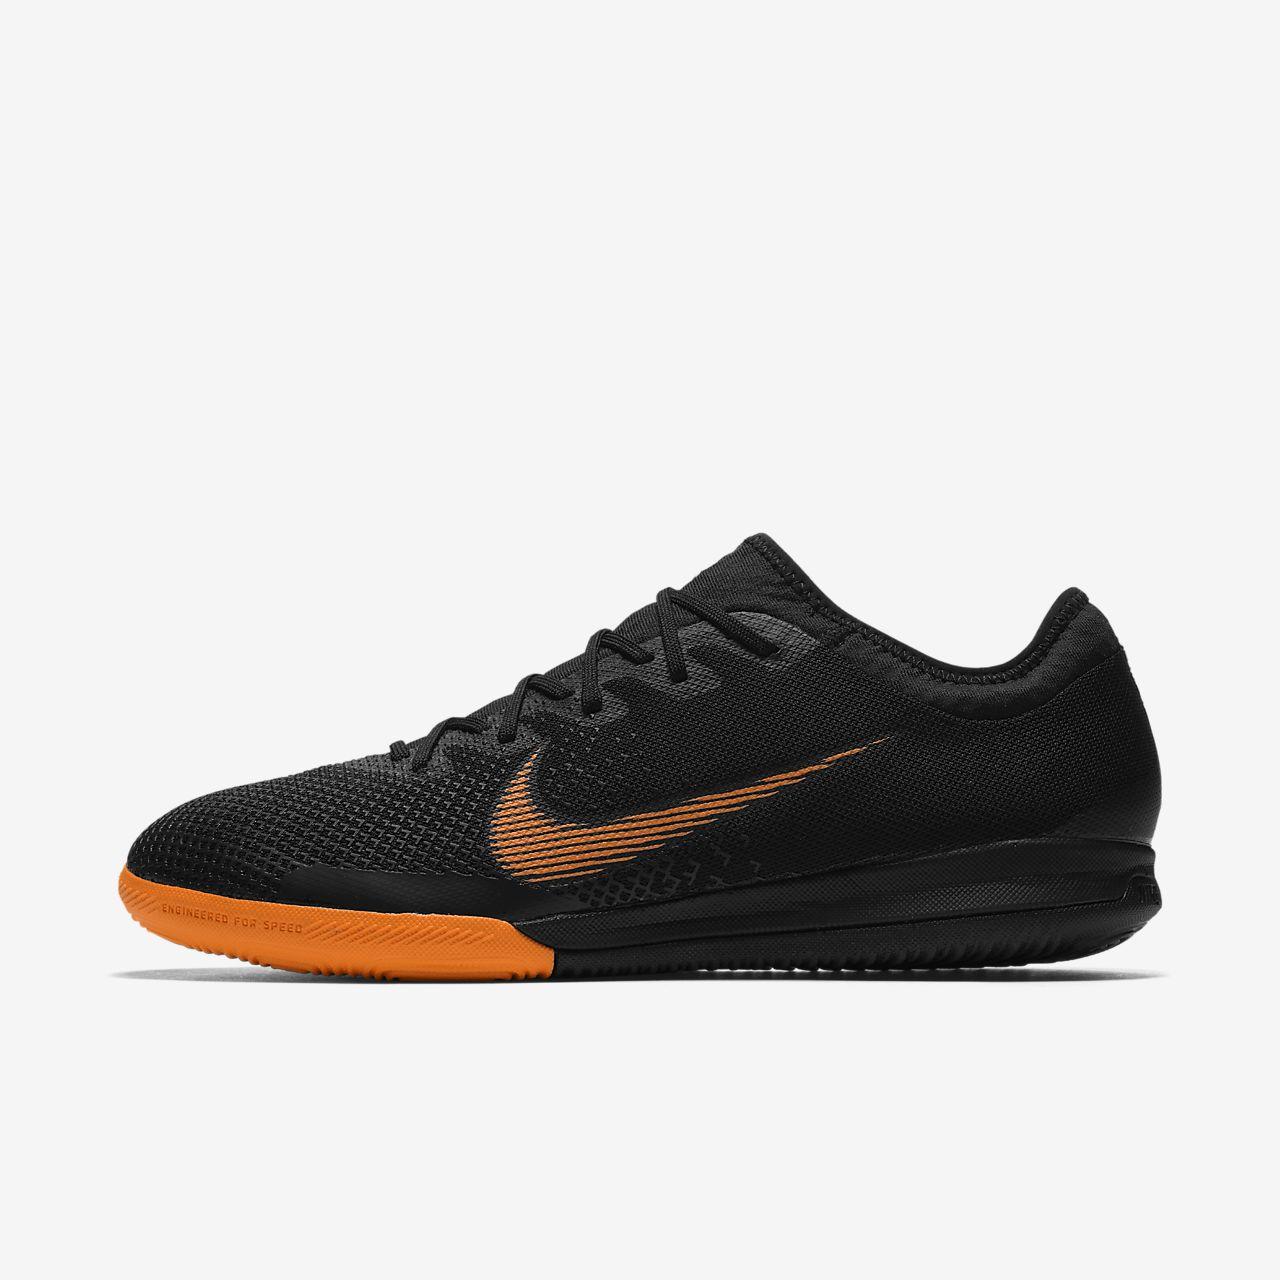 Nike MercurialX Vapor XII Pro IC Black White Total Orange AH7387081